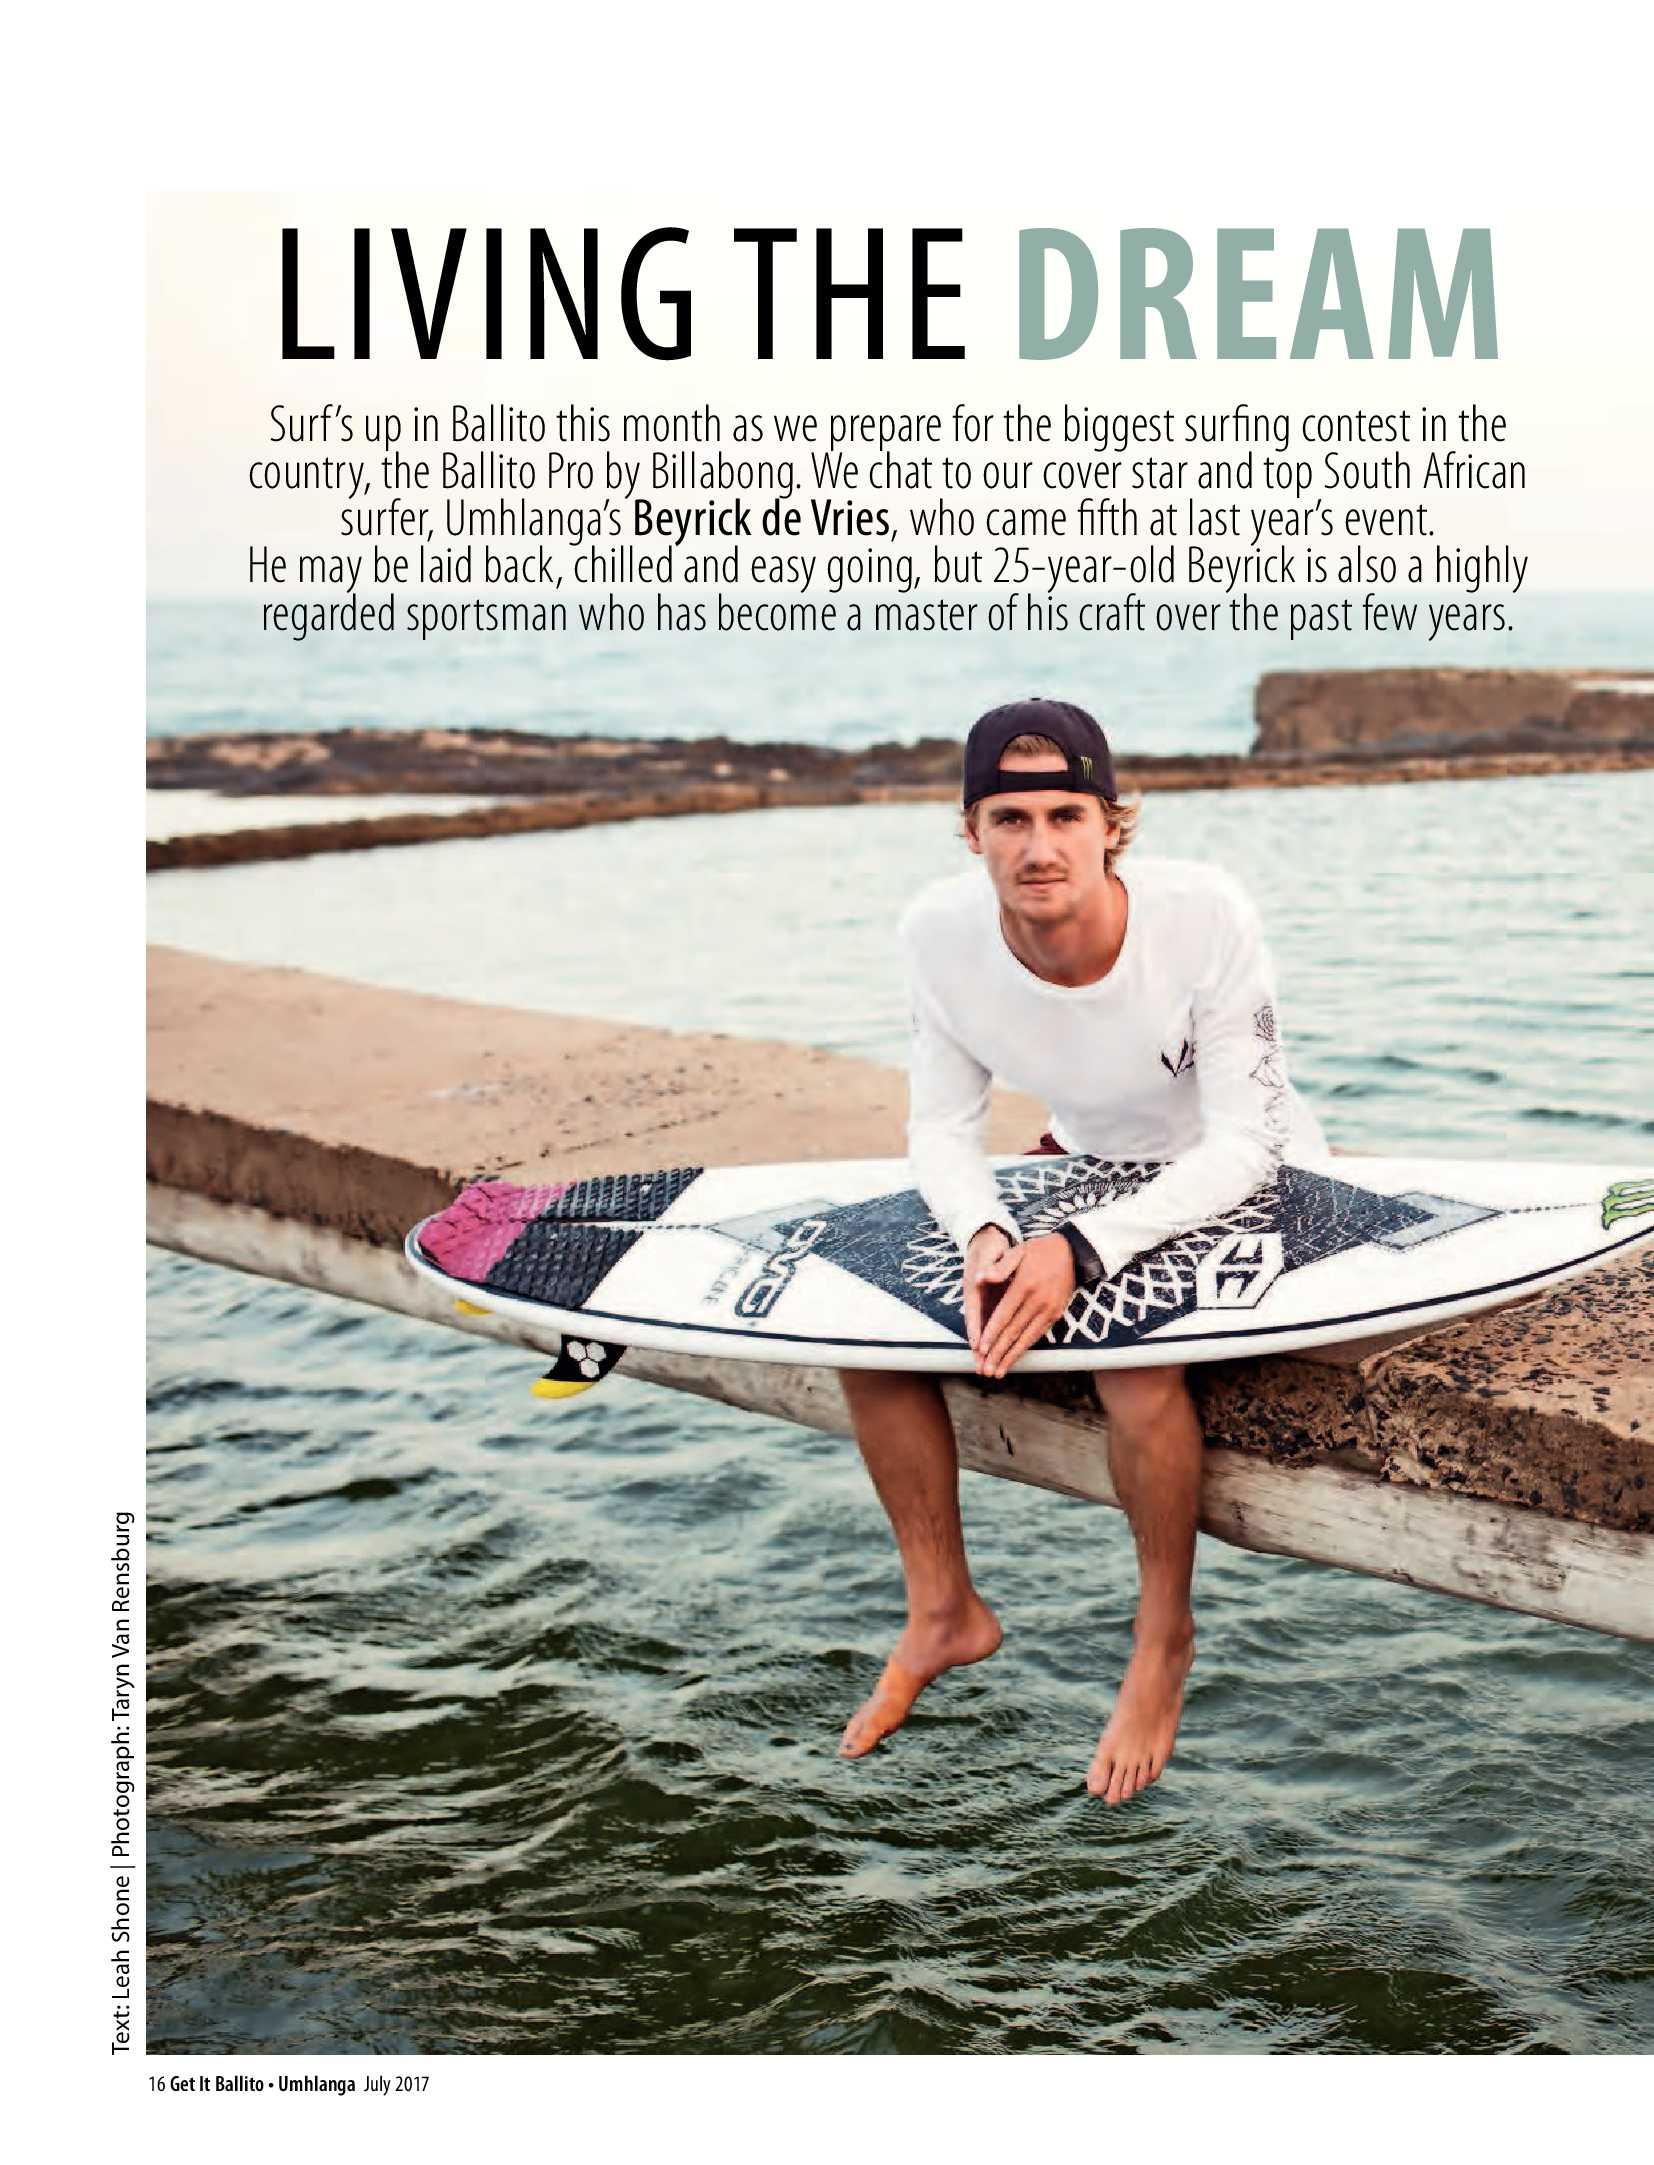 get-magazine-ballitoumhlanga-july-2017-2-epapers-page-18